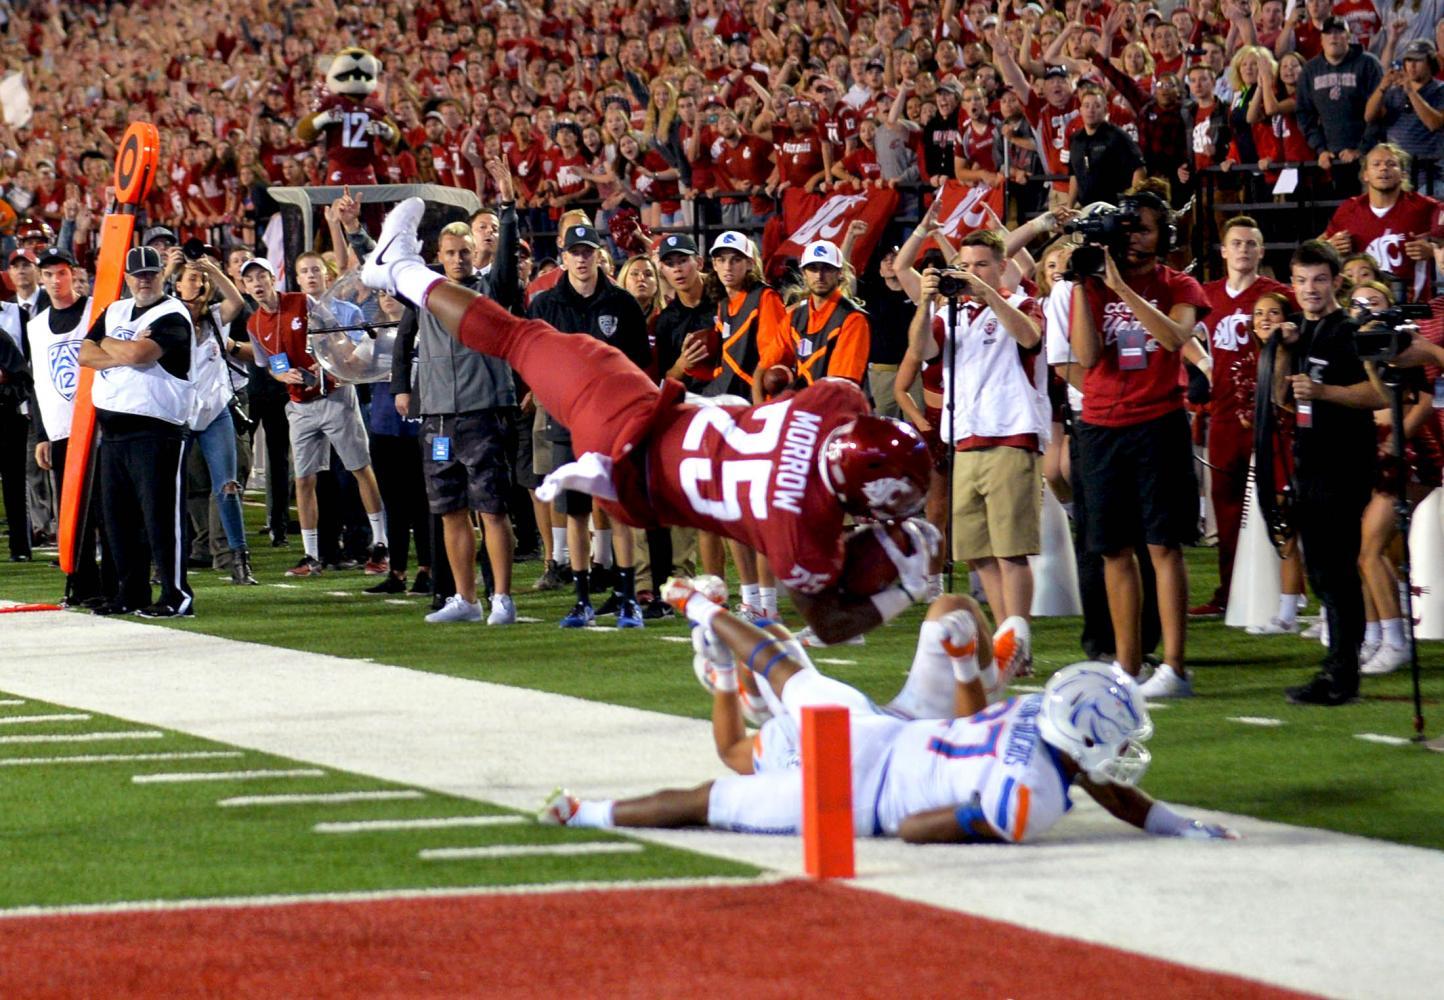 Senior running back Jamal Morrow  scores the winning touchdown against Boise State University on Saturday at Martin Stadium.